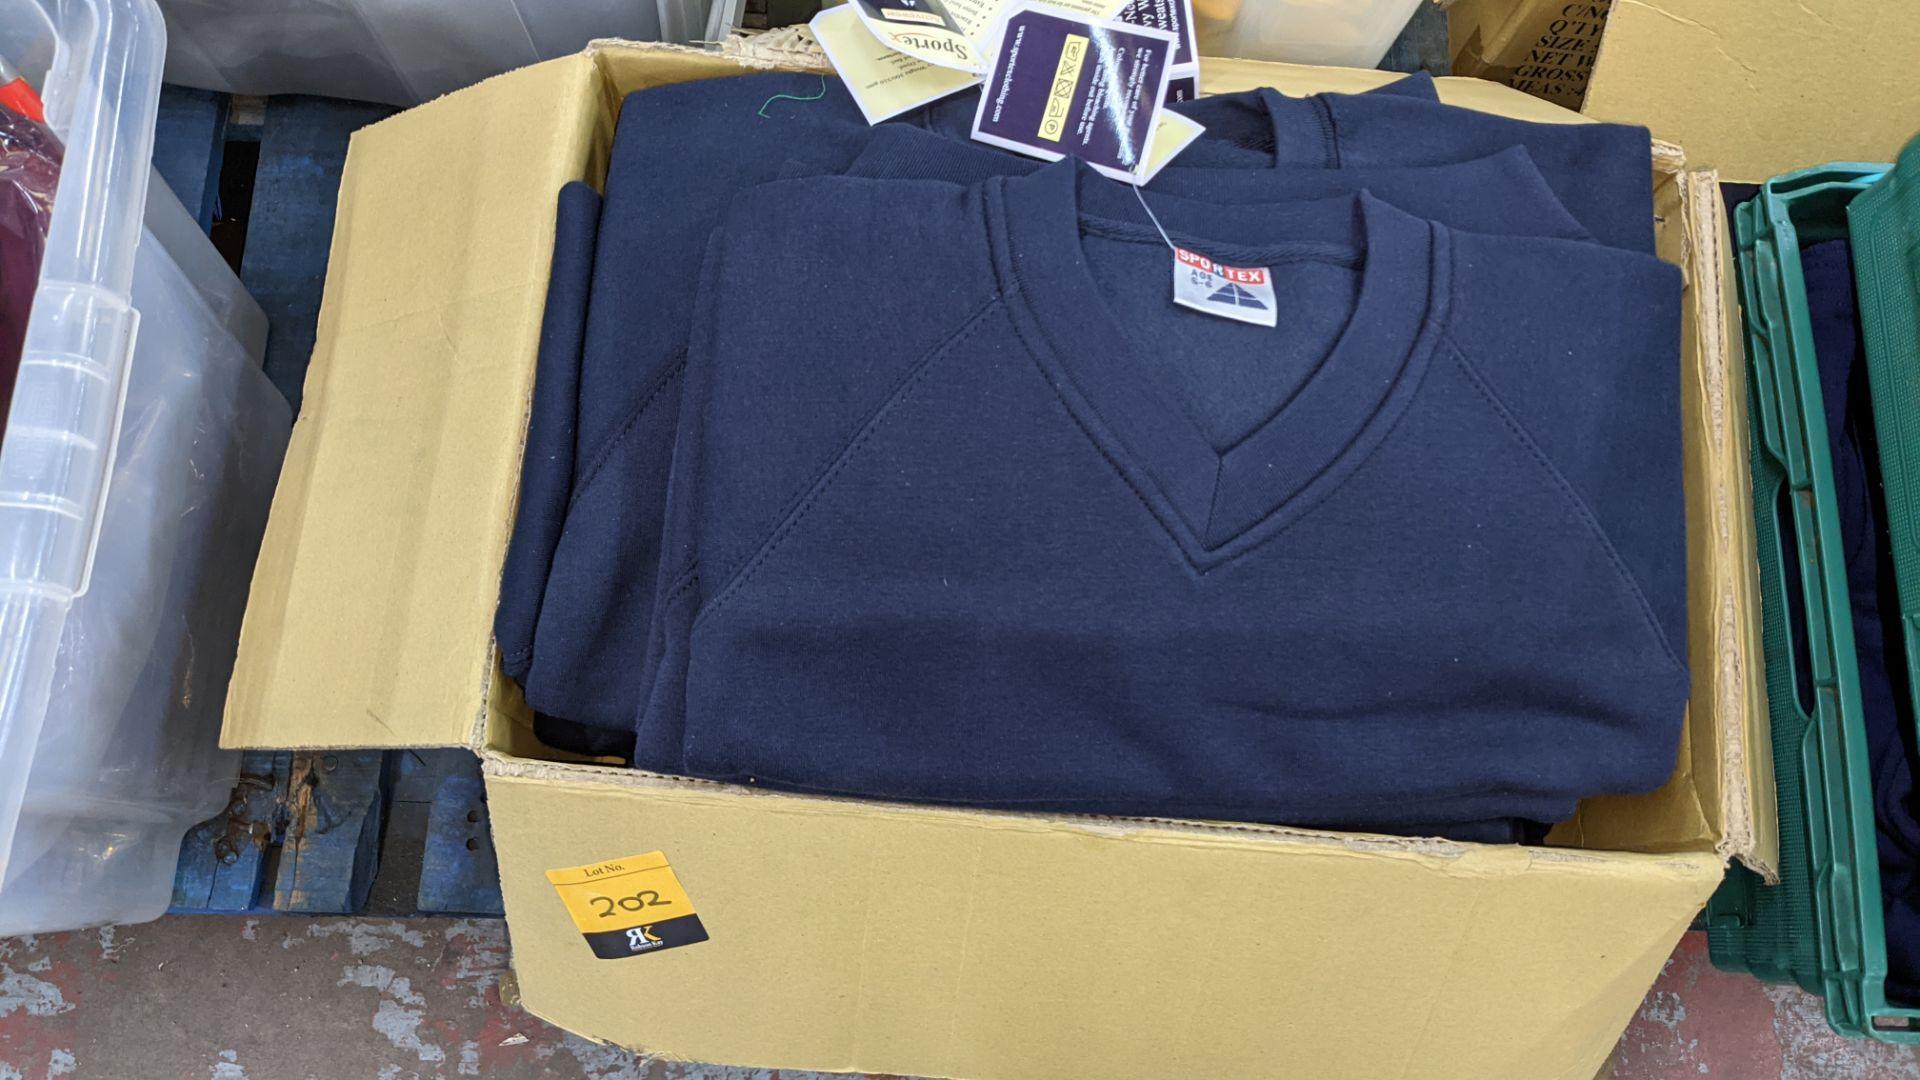 Approx 14 off Sportex children's blue V-neck sweatshirts - Image 2 of 4